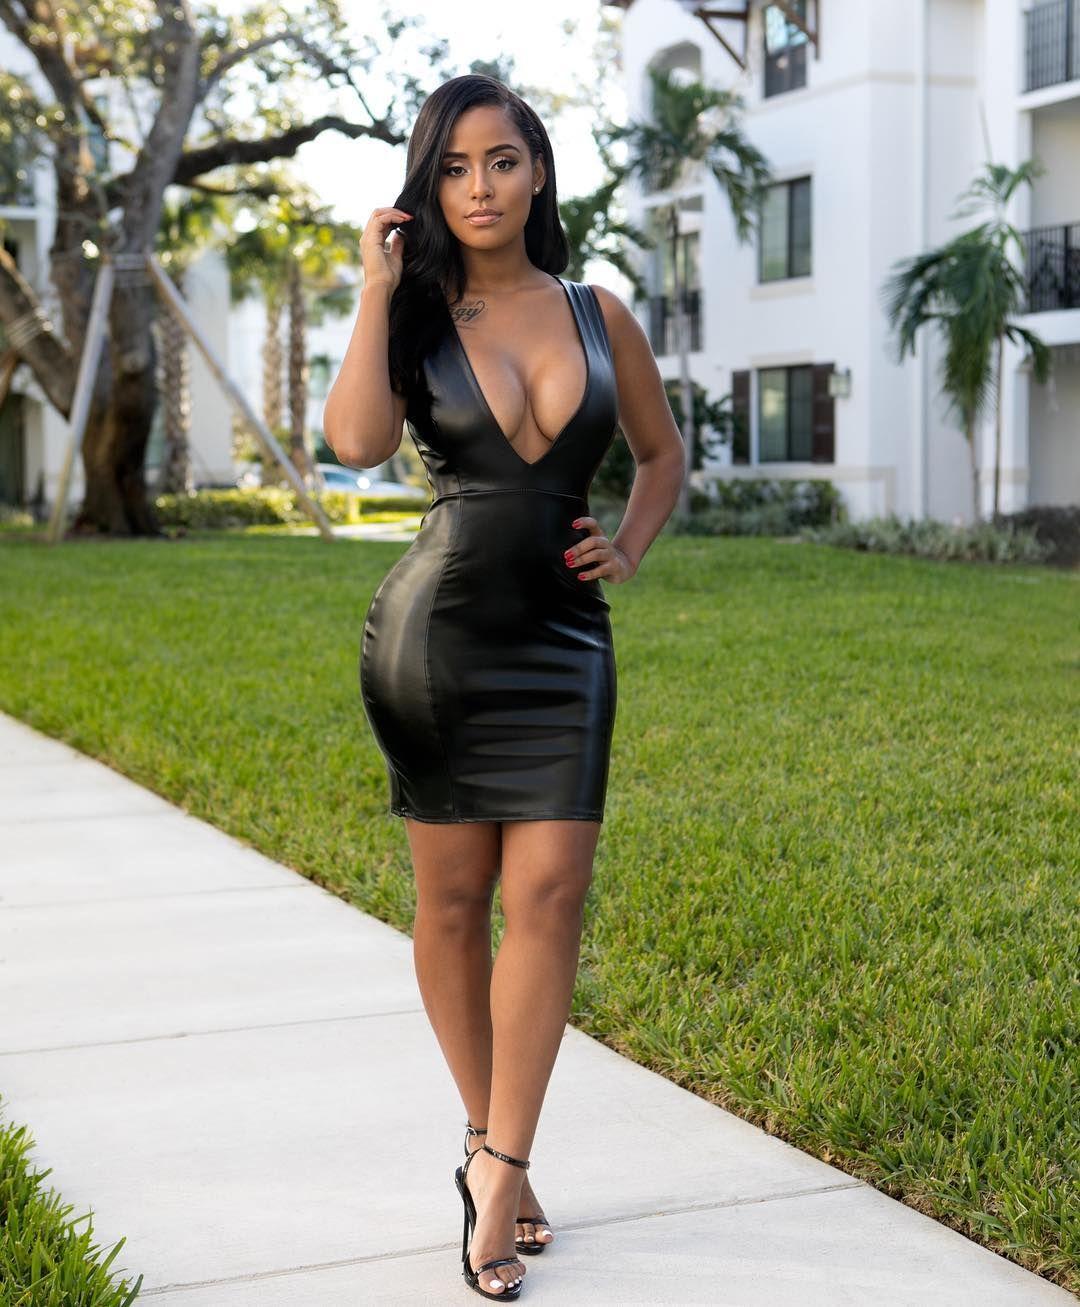 Sexy black miami girl gets nice smooth fuck 4